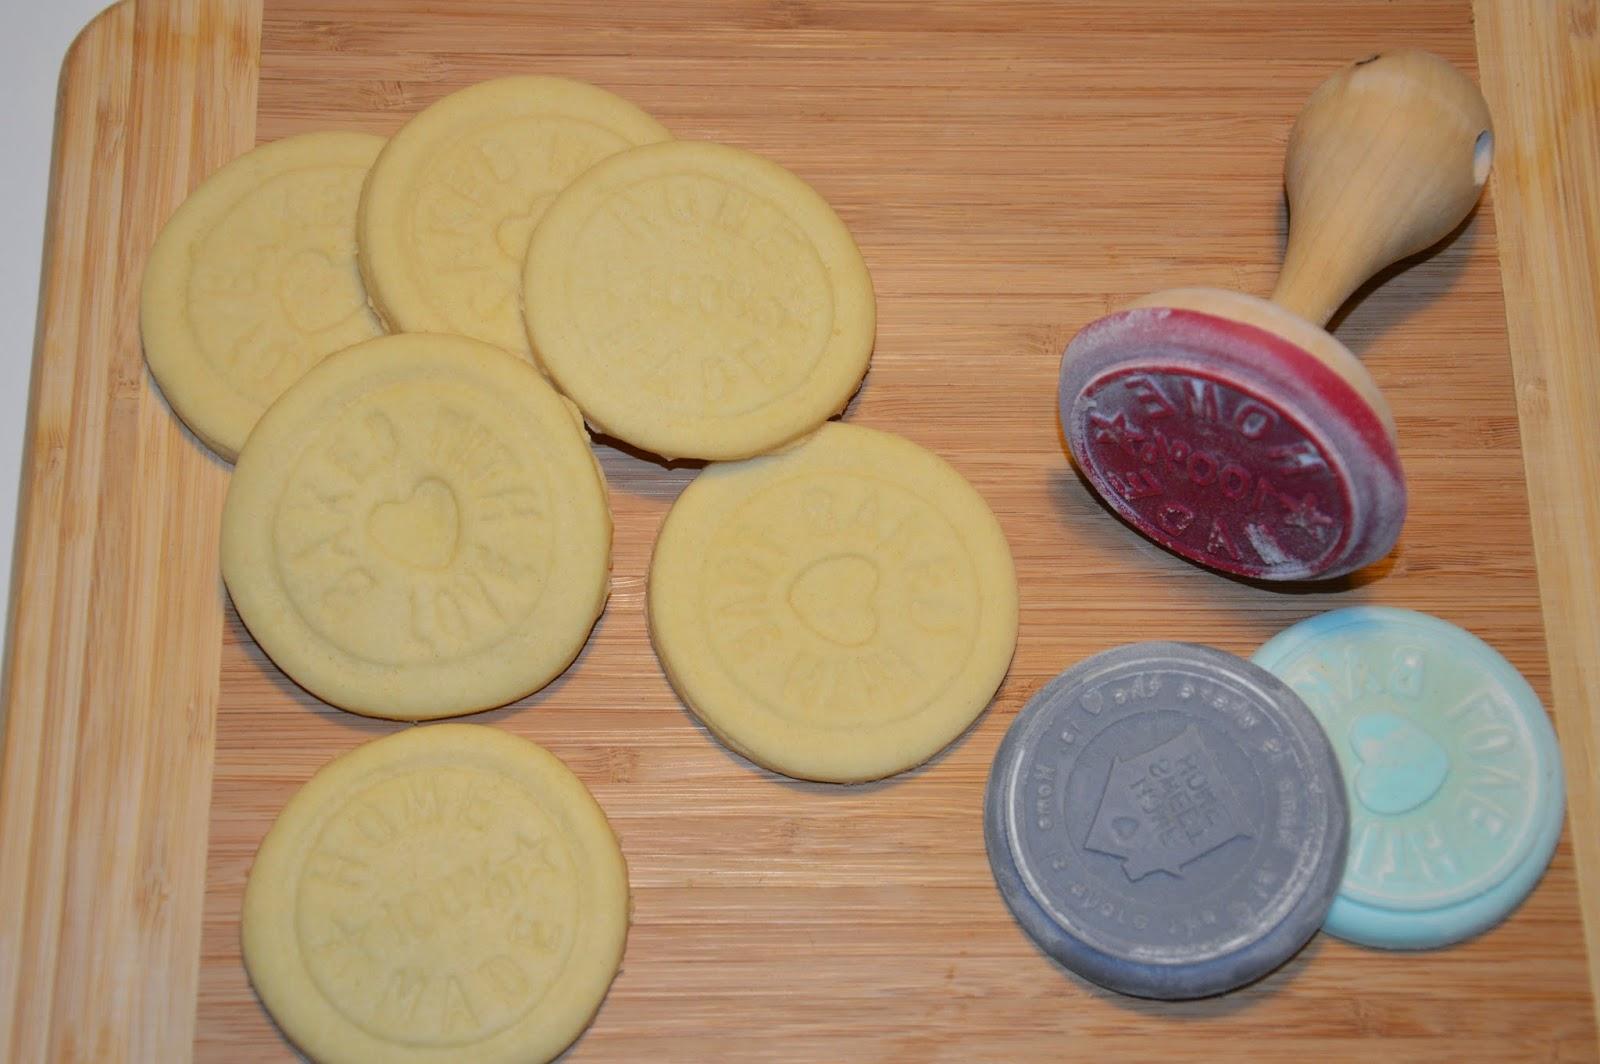 Neu Glitzerkram: Stempel Cookies Schlussverkauf SocMVLSv